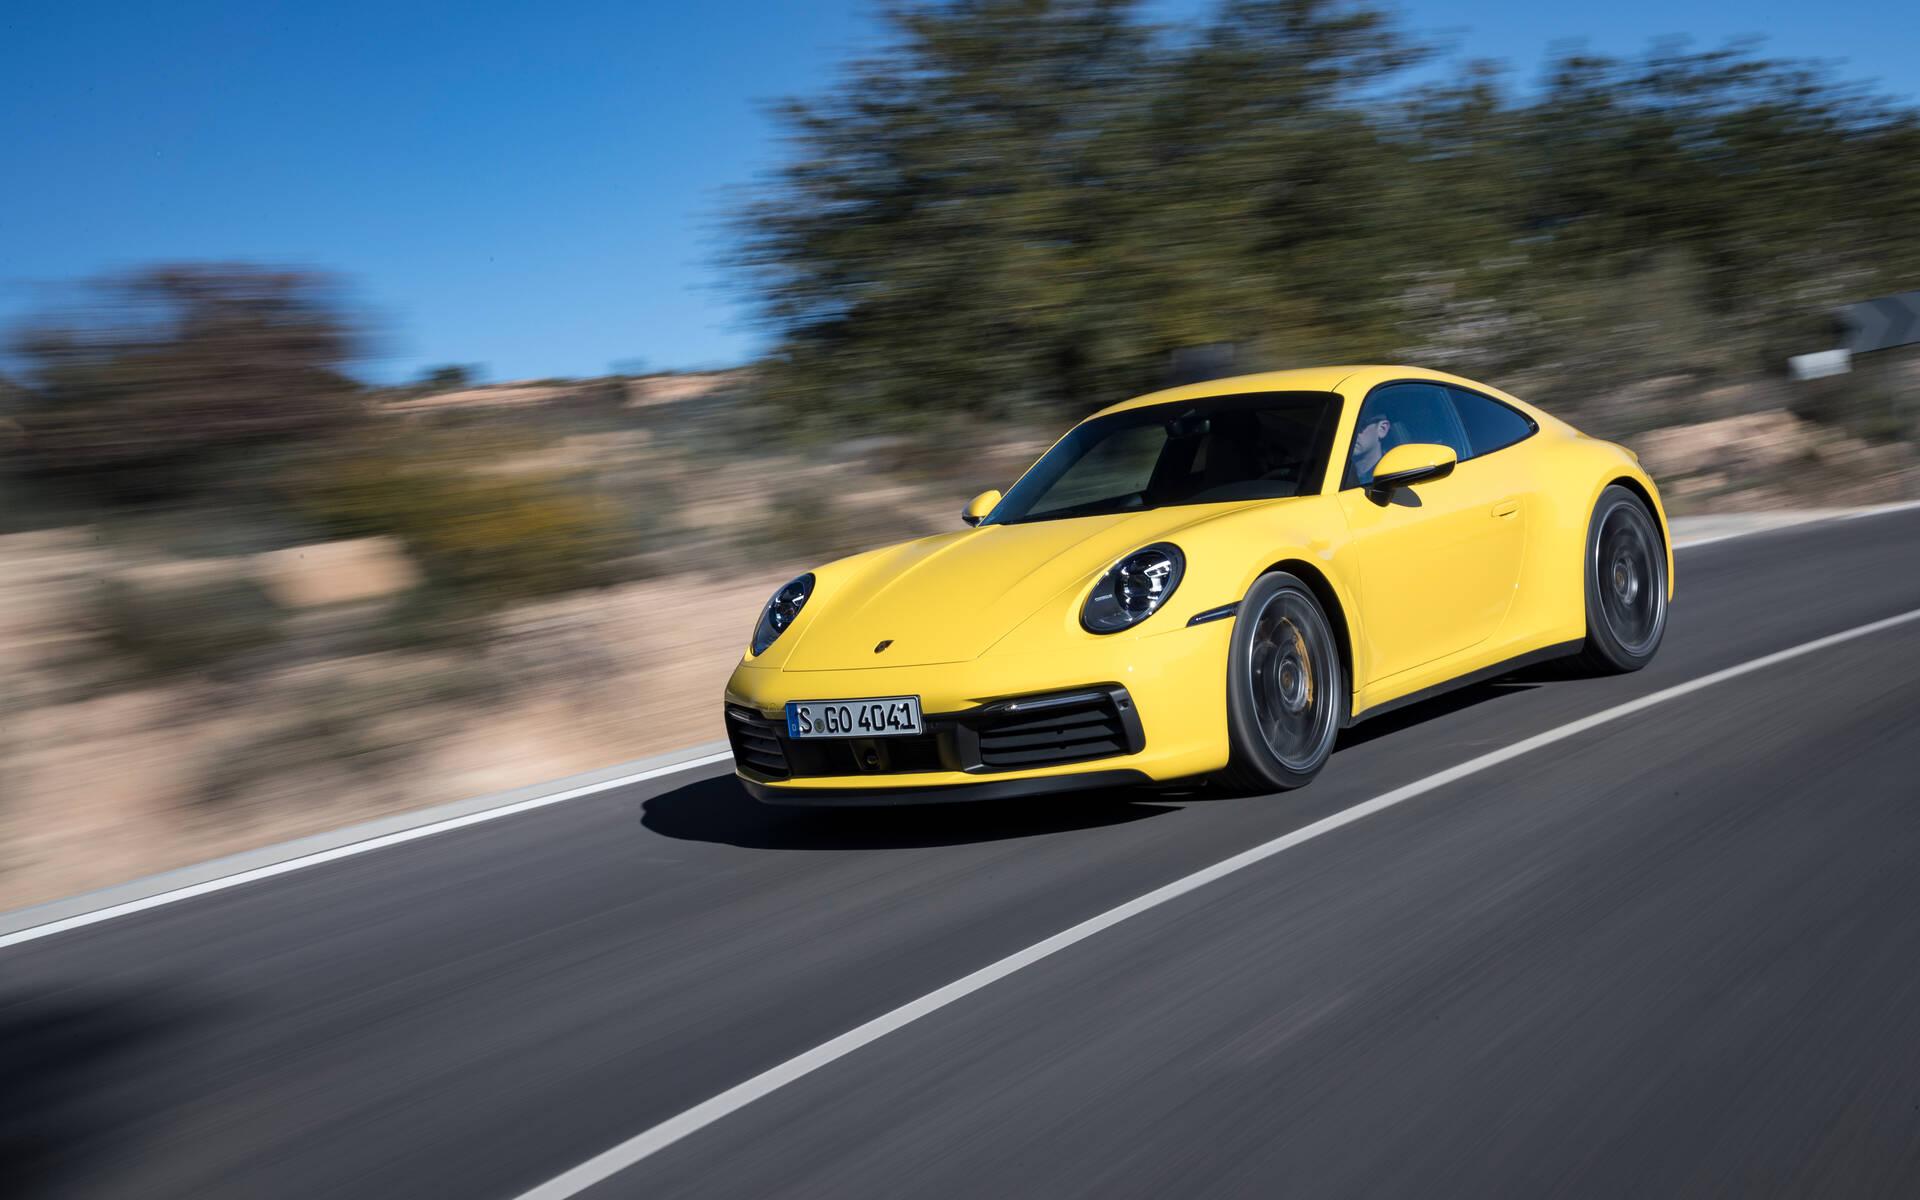 Porsche 911 Carerra 4S